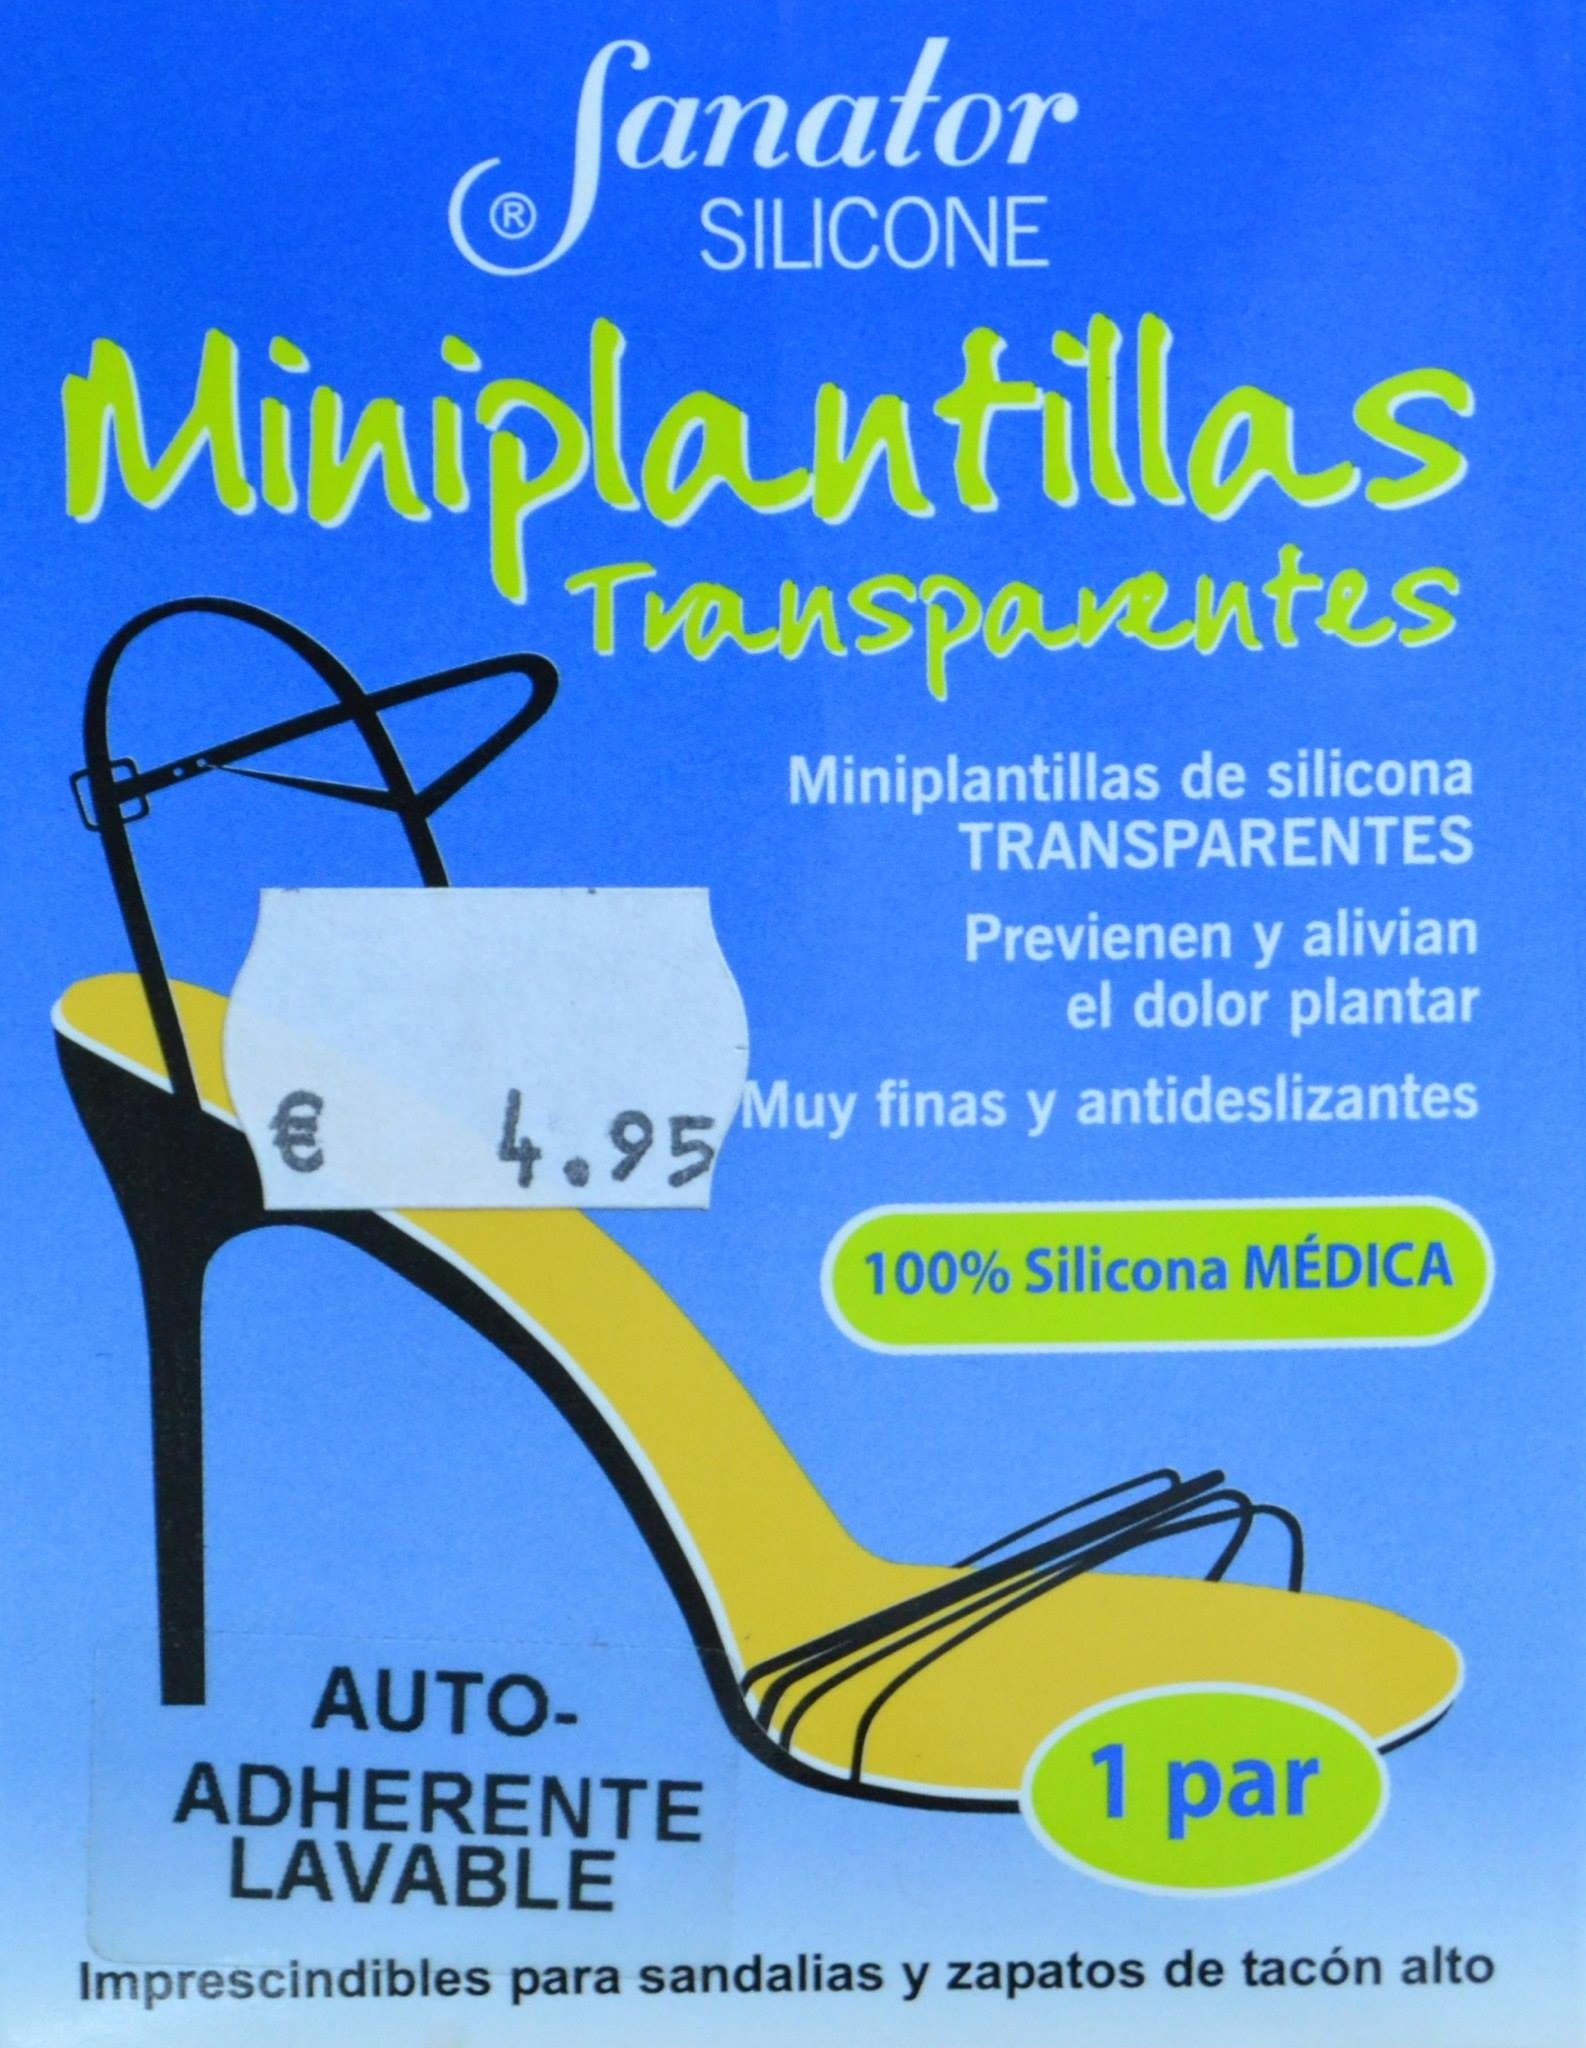 Anna Riba Silicona Farmacia Par Sanator Miniplantillas 1 Transparentes jL54RA